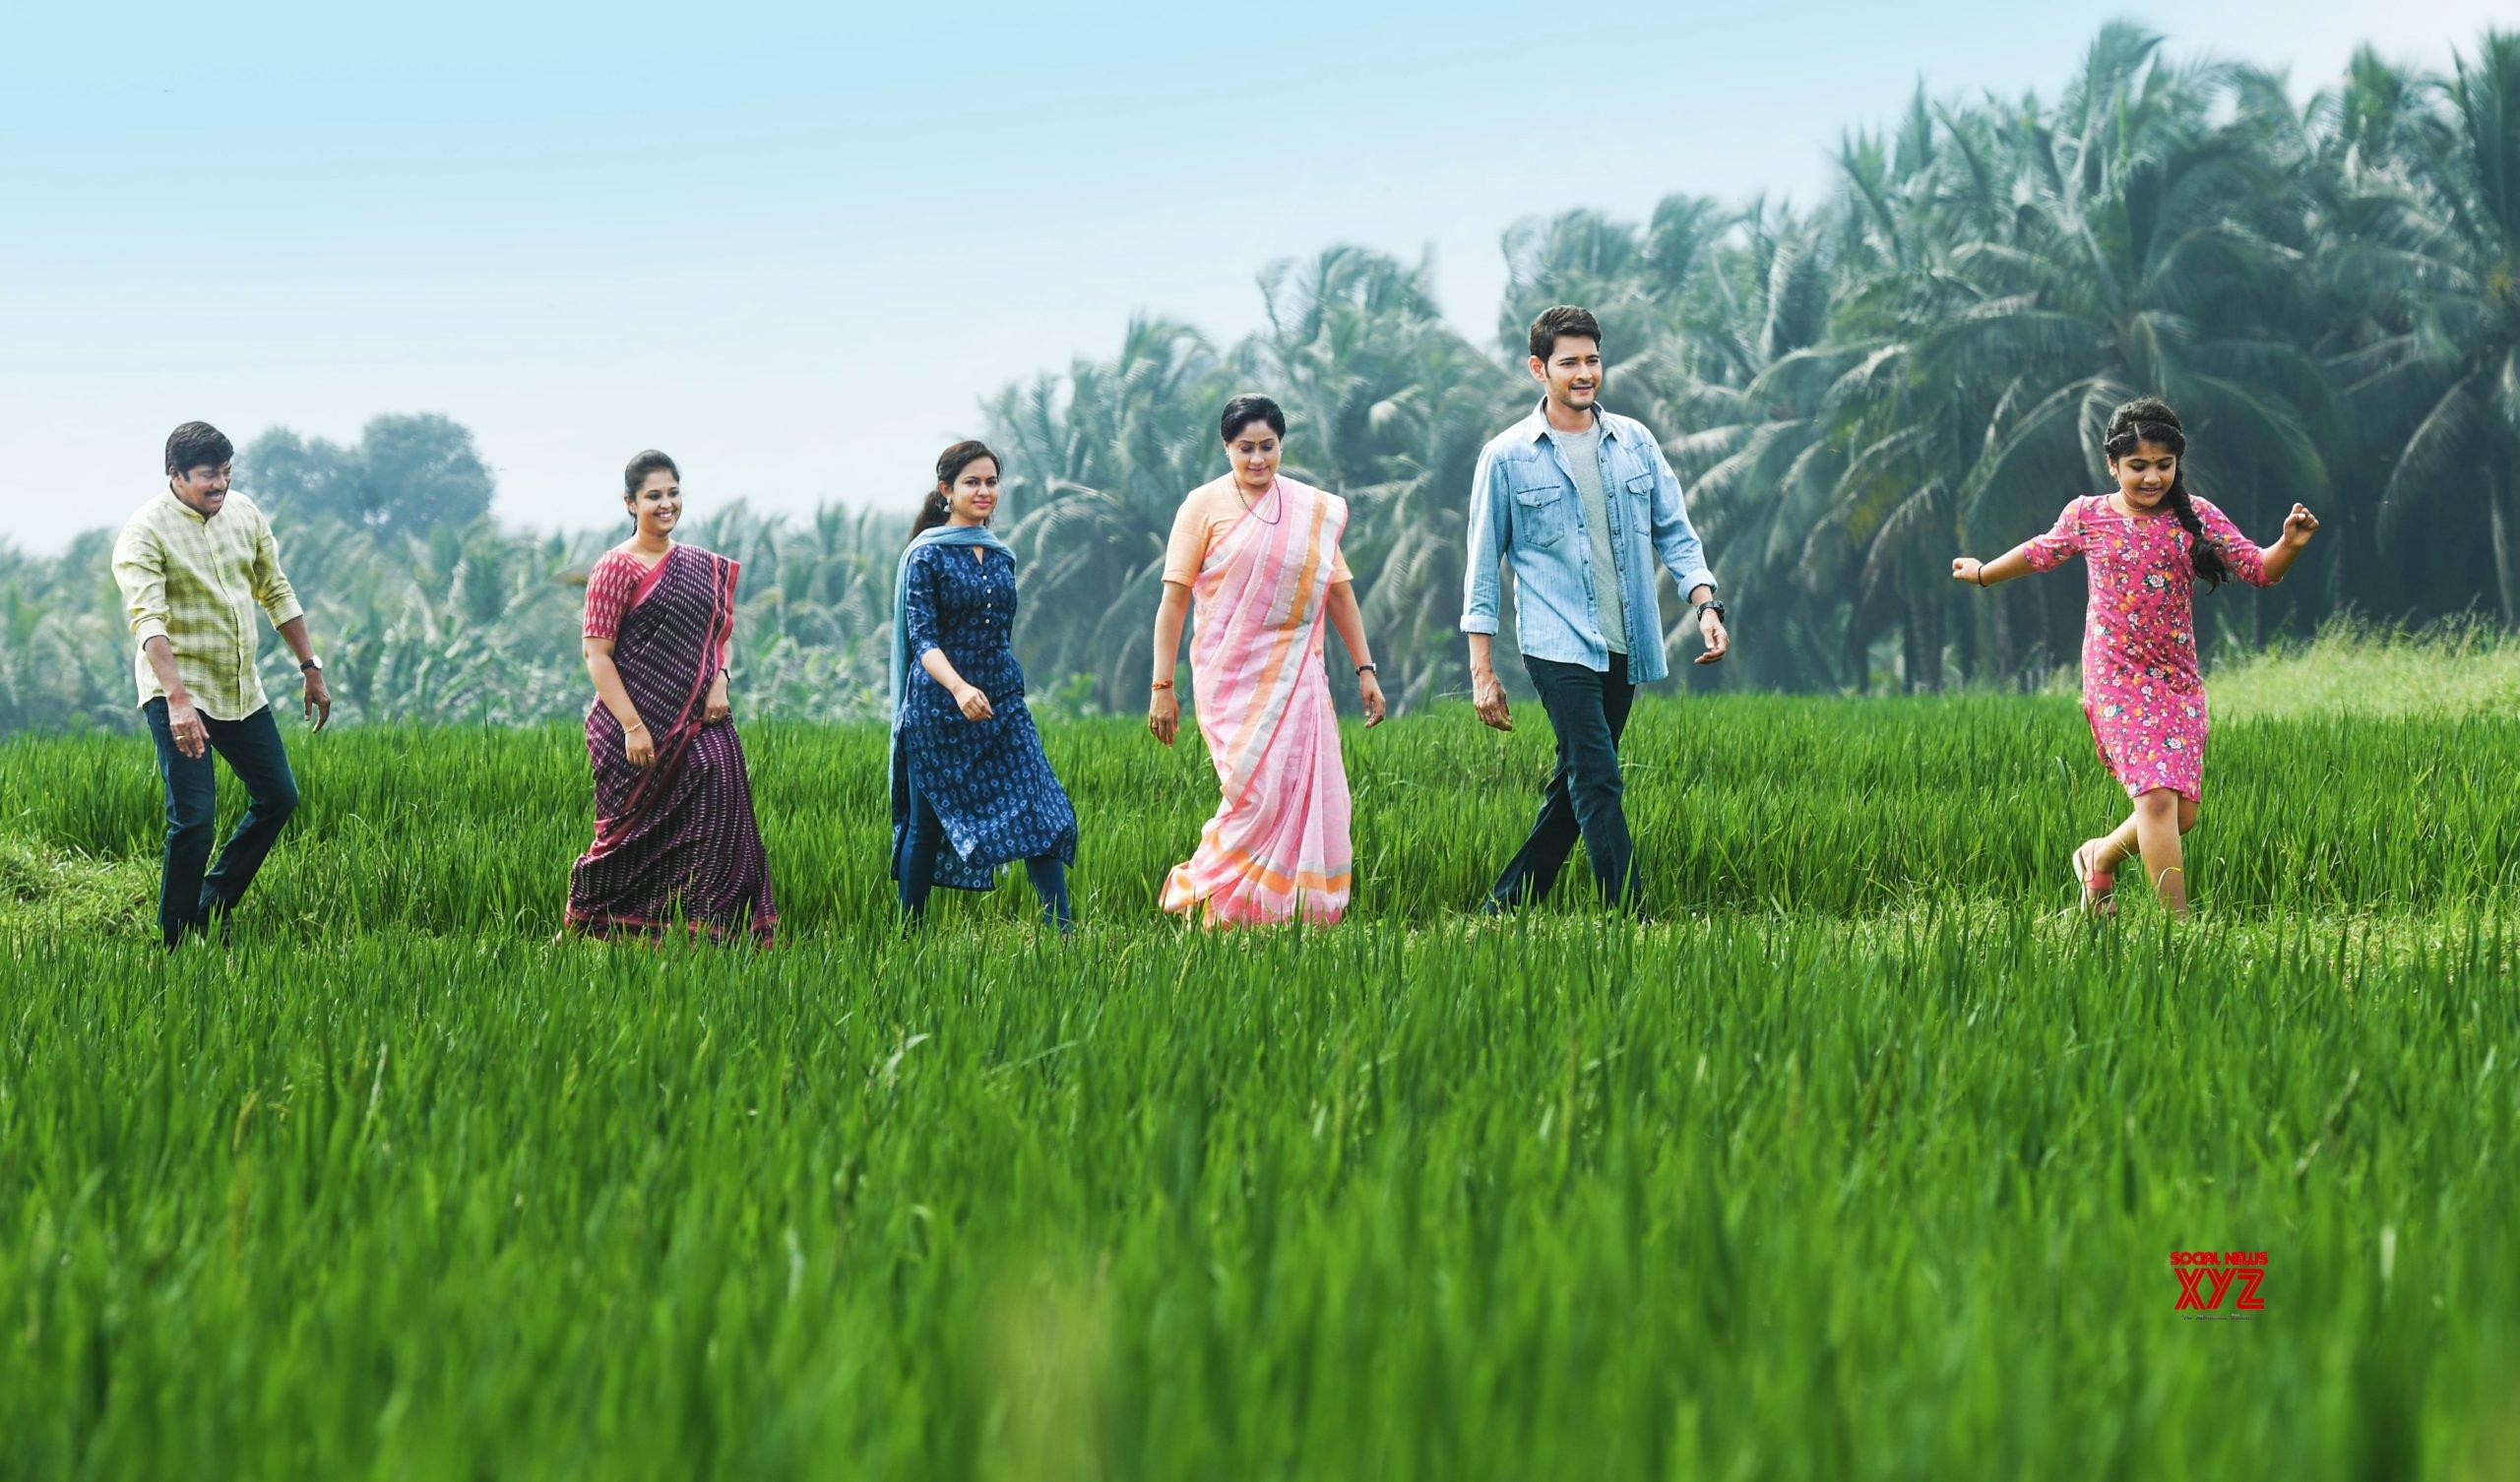 Superstar Mahesh's Sarileru Neekevvaru Second Song Suryudivo Chandrudivo Will Be Out On Monday At 5:04 PM